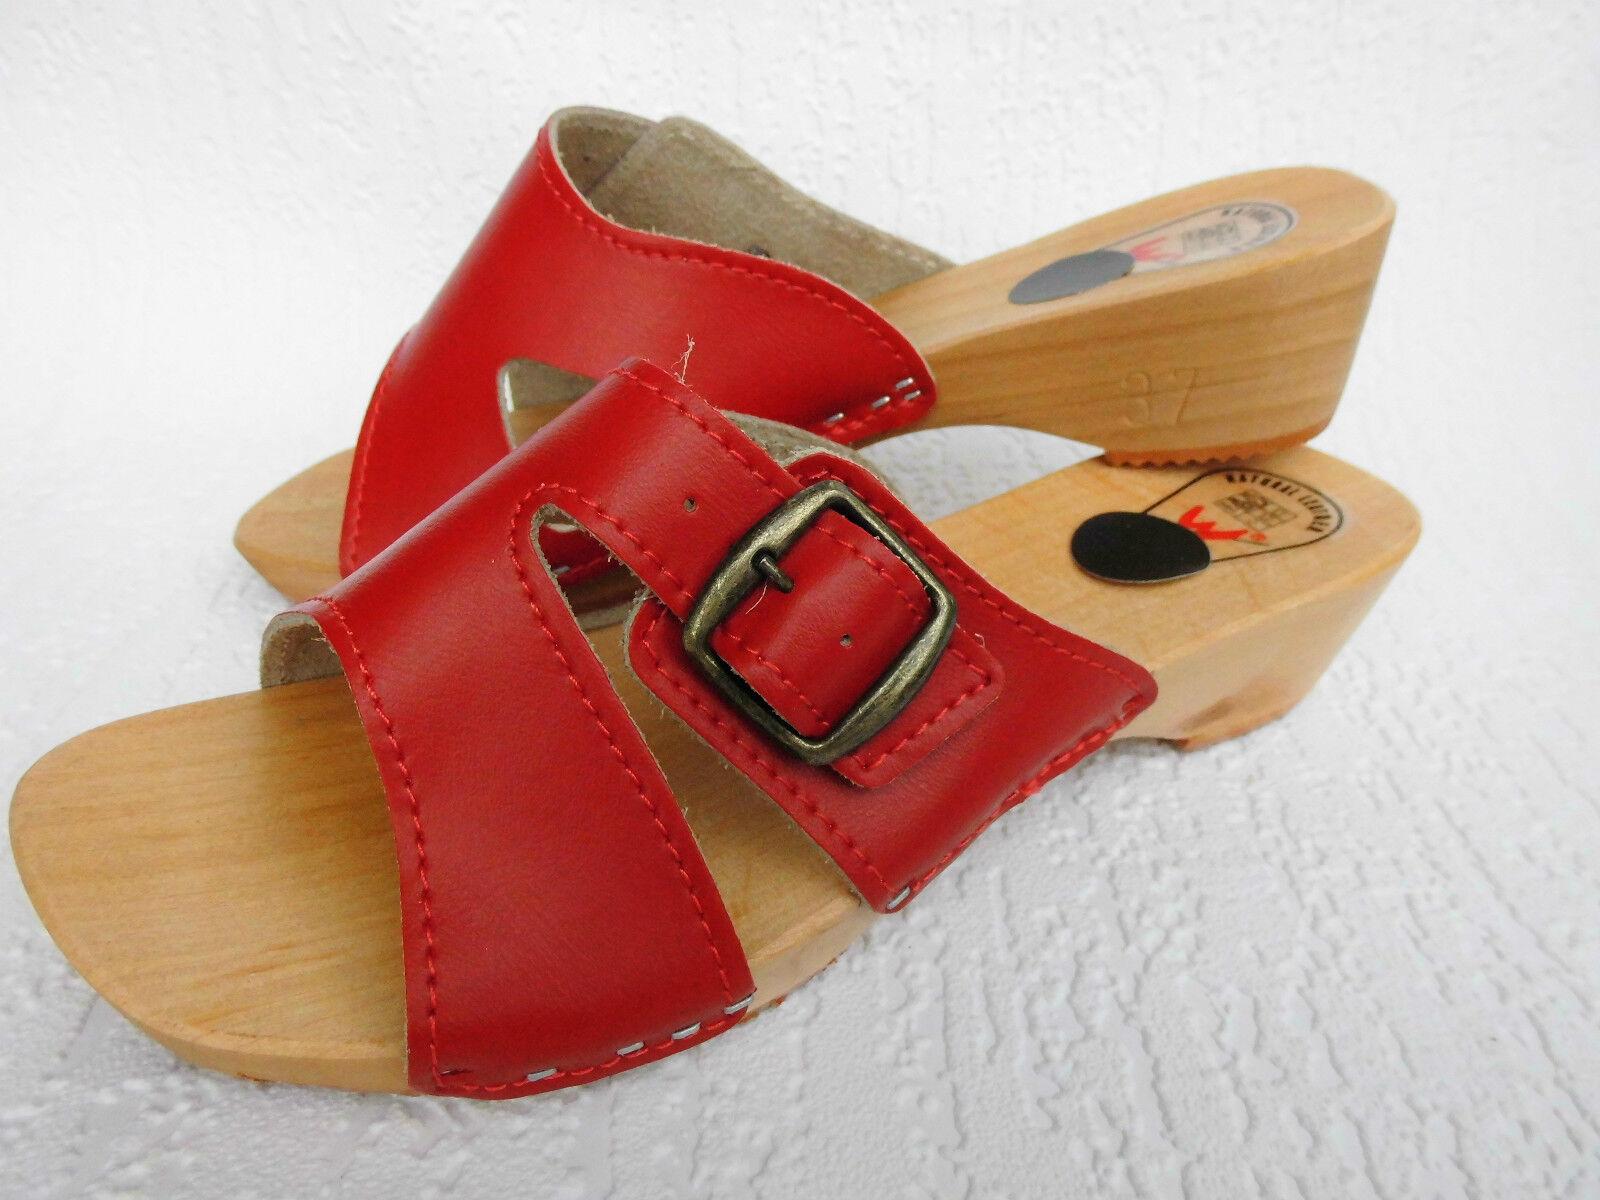 HOLZ Rot, (e) CLOGS Holz Pantolette Gr.36, Echt LEDER, Rot, HOLZ (Made in Poland 254-4-93) dd18e8